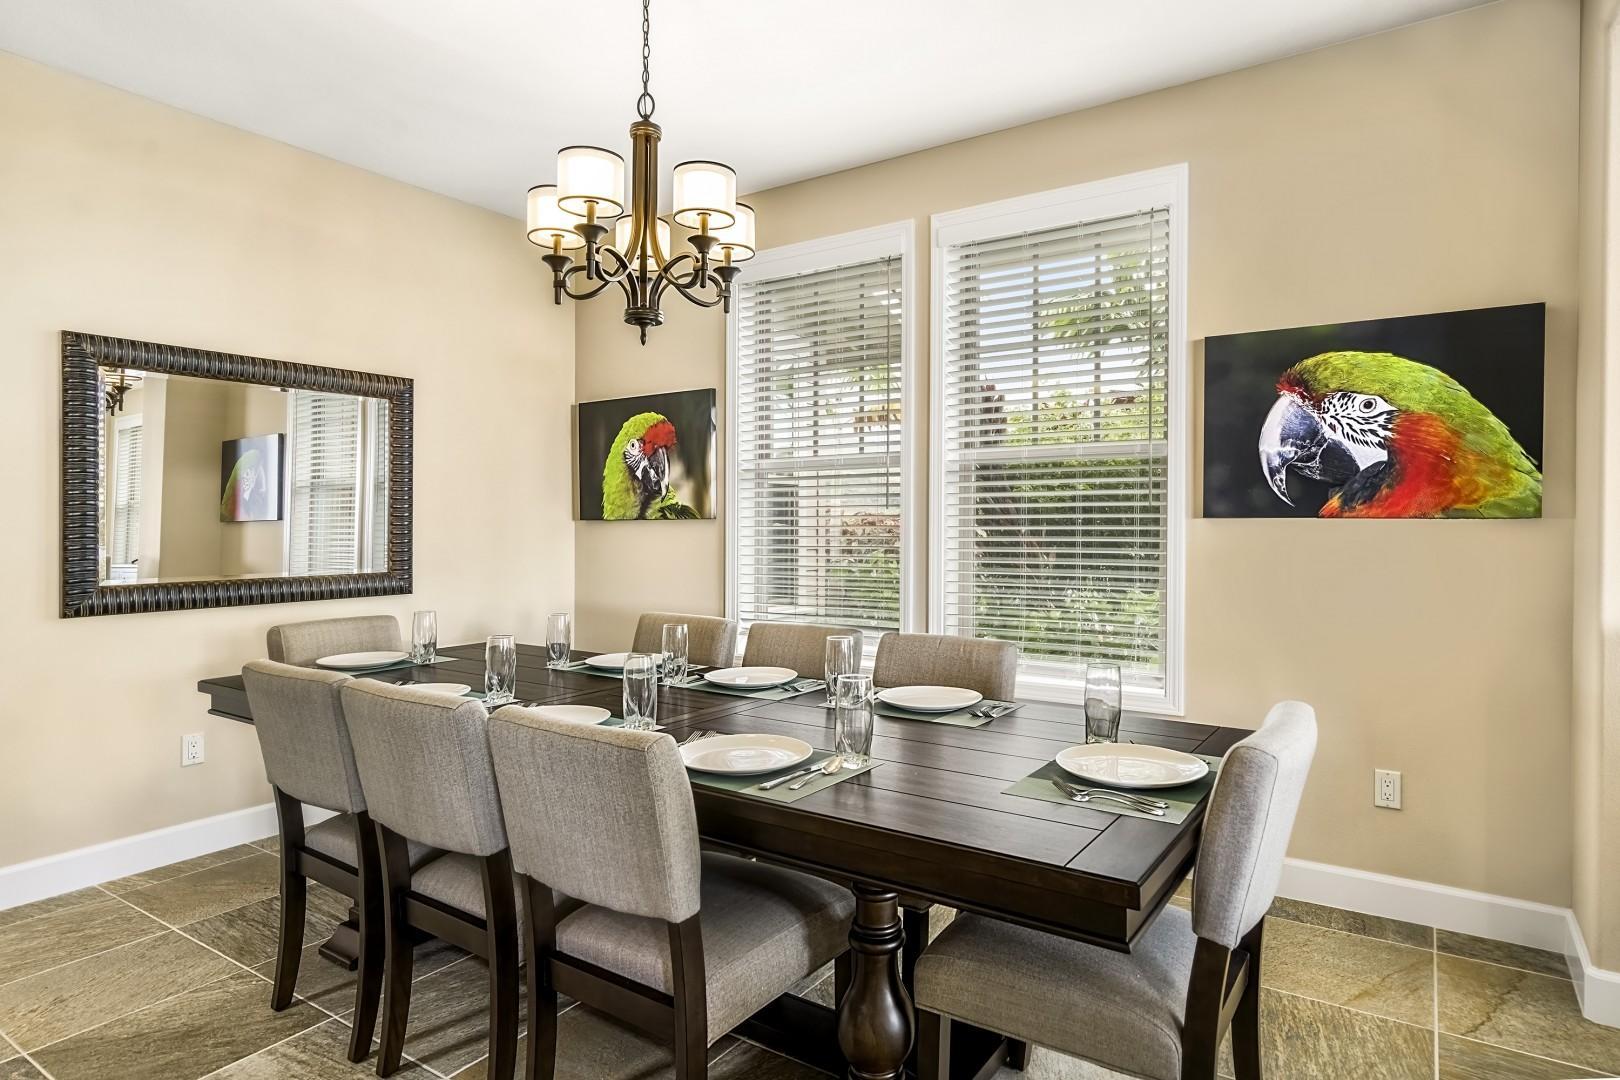 Spacious indoor dining area